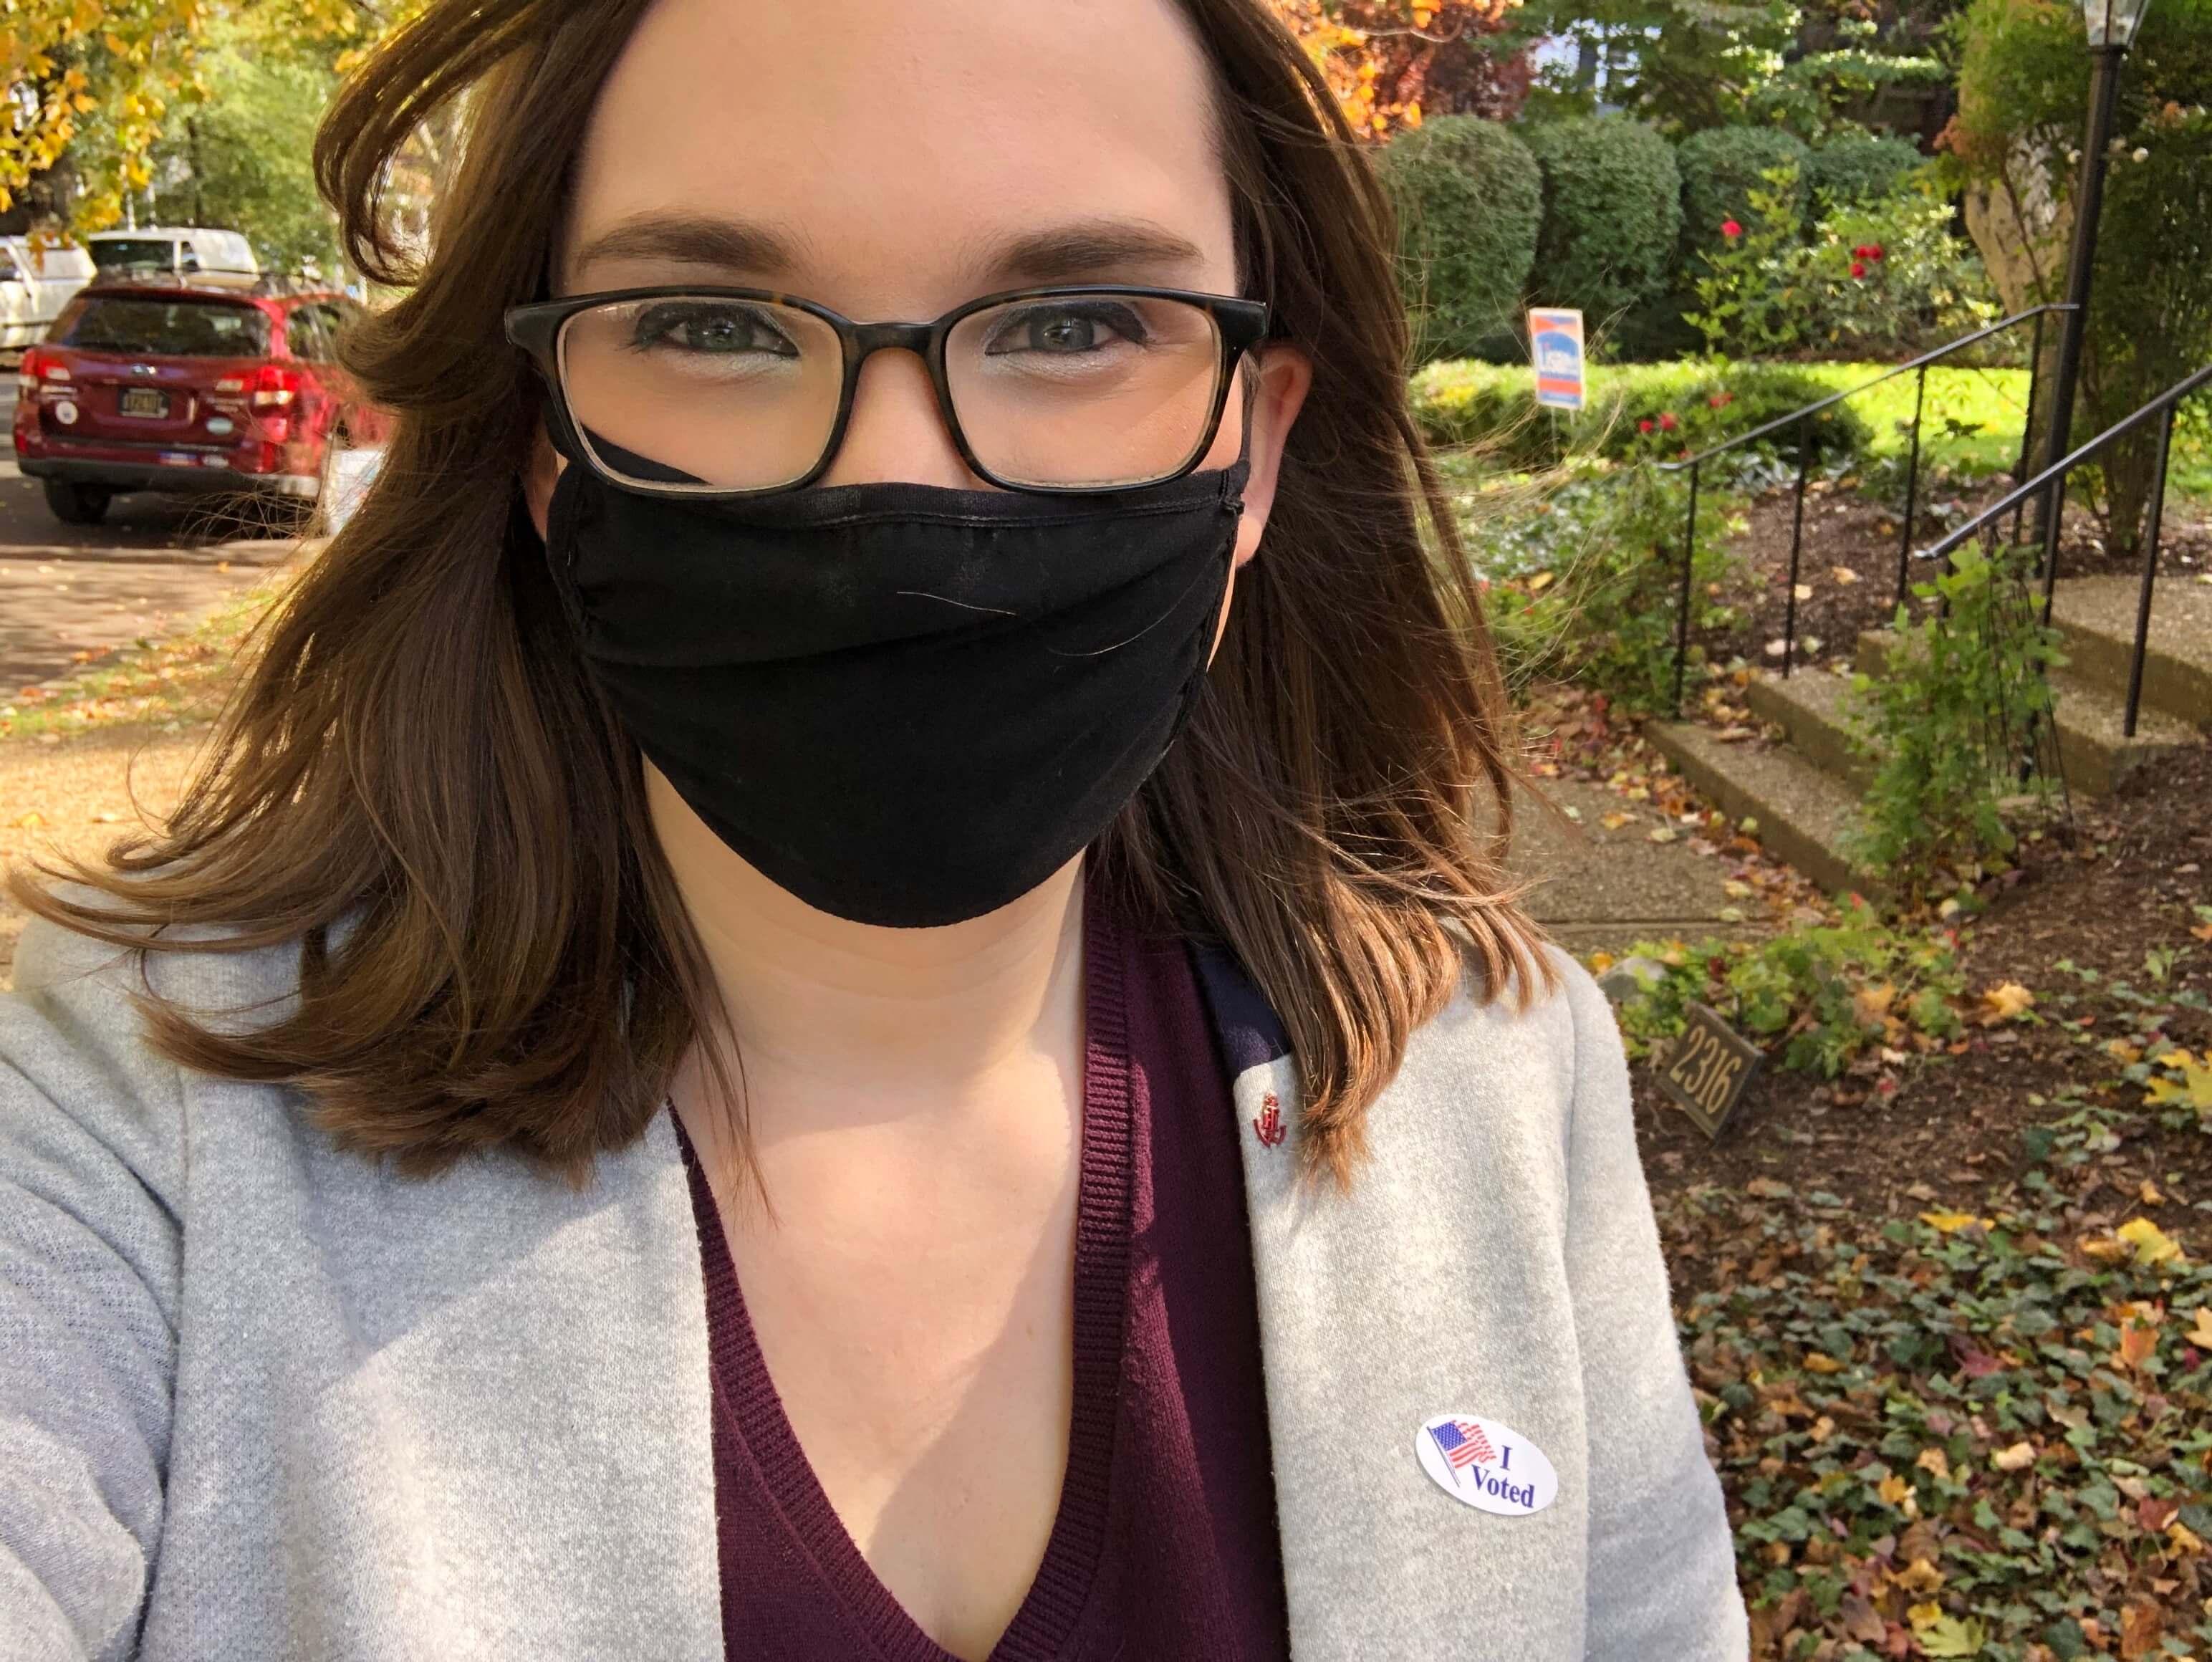 Sarah McBride on Election Day